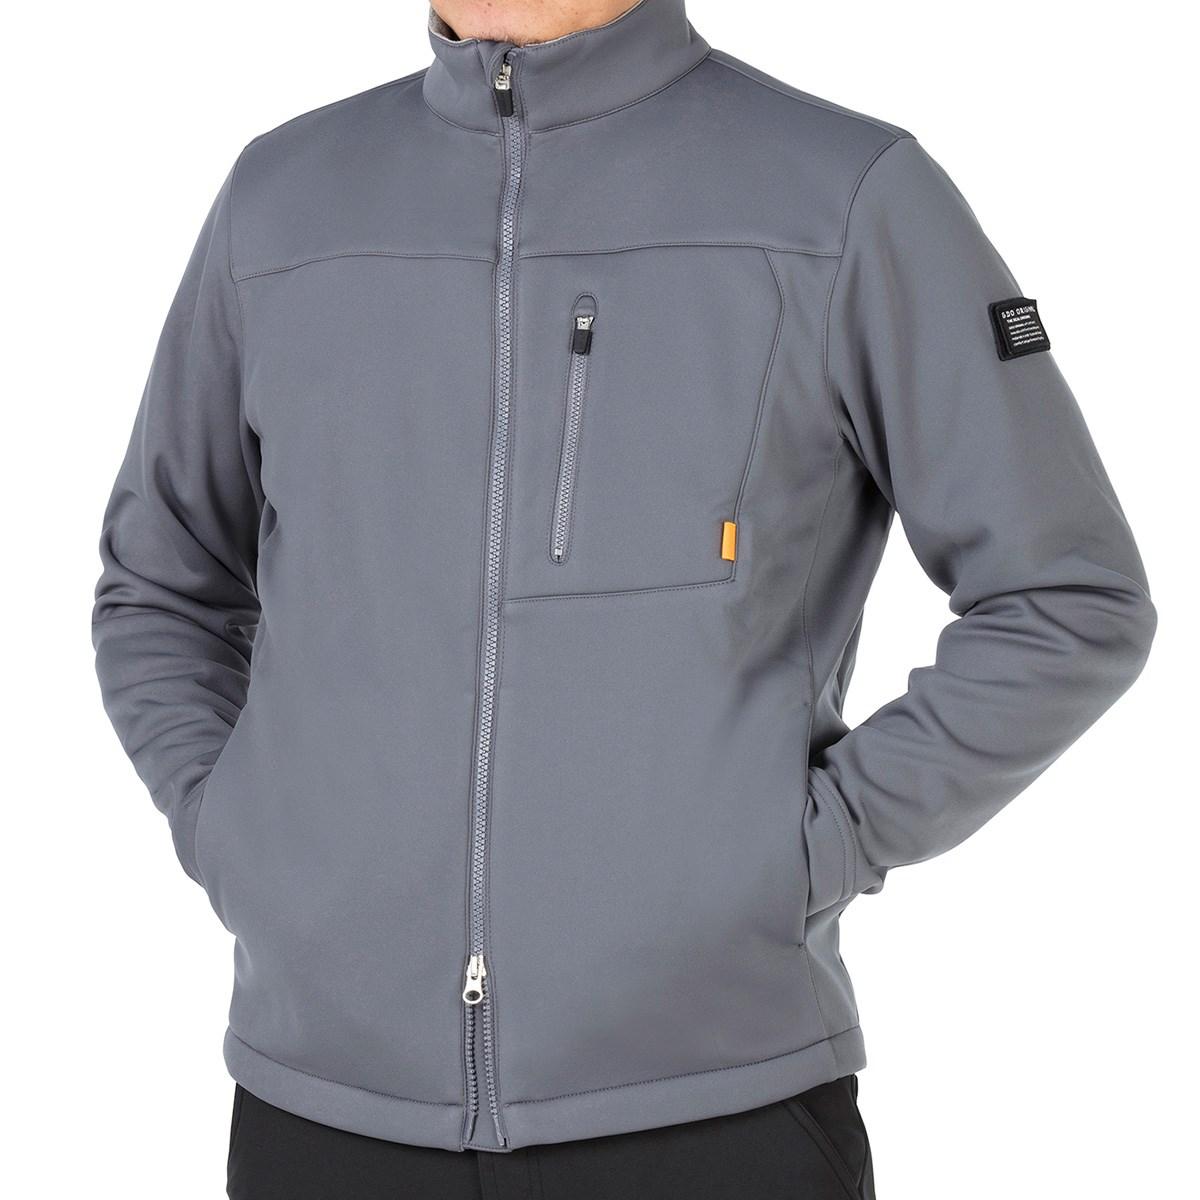 GDO オリジナル GDO ORIGINAL 裏フリースボンディングジャケット XXL グレー